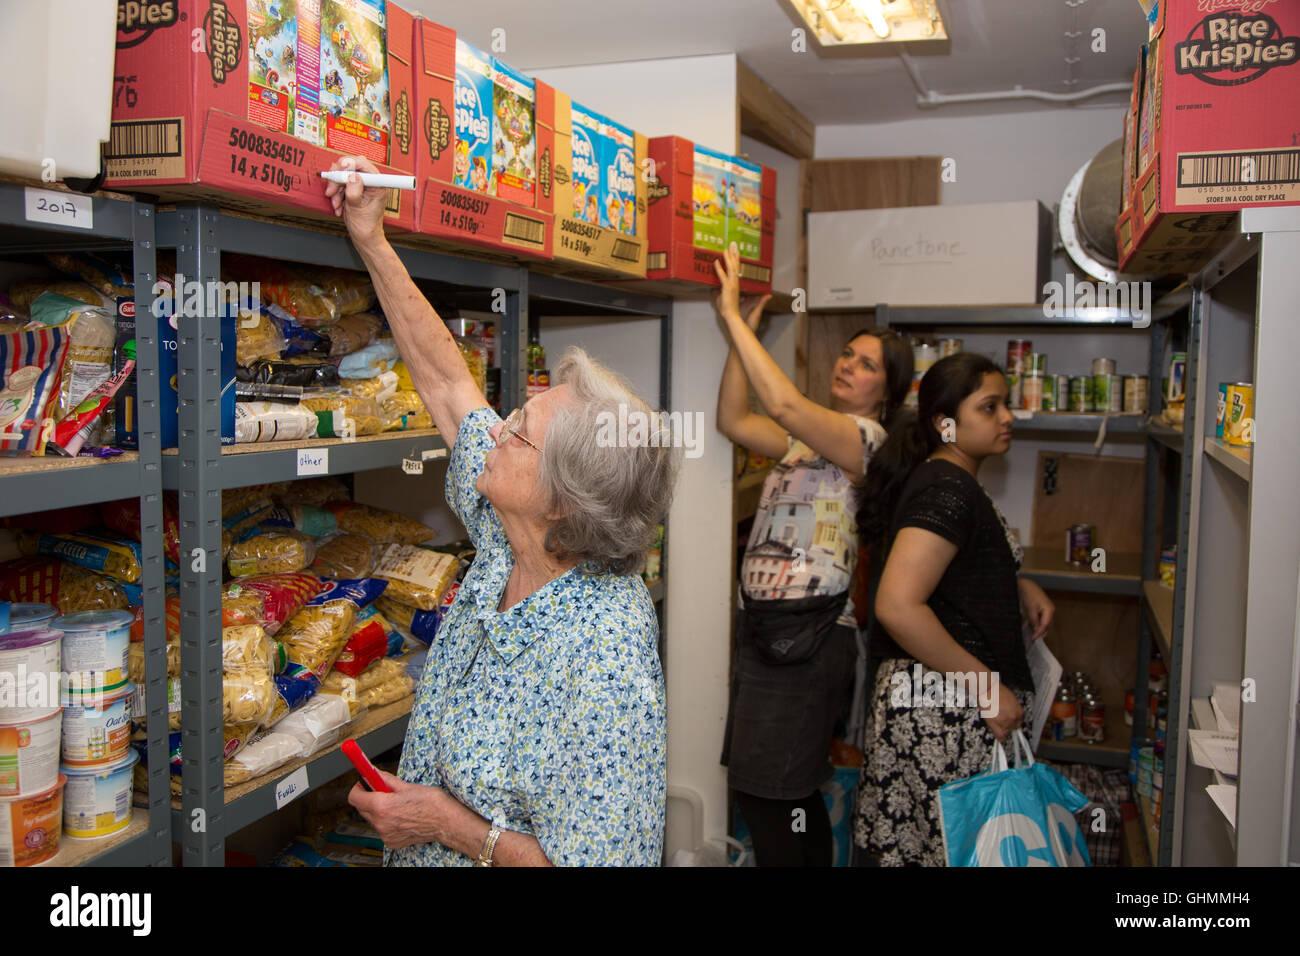 Volunteers stock shelves at North Paddington foodbank - Stock Image